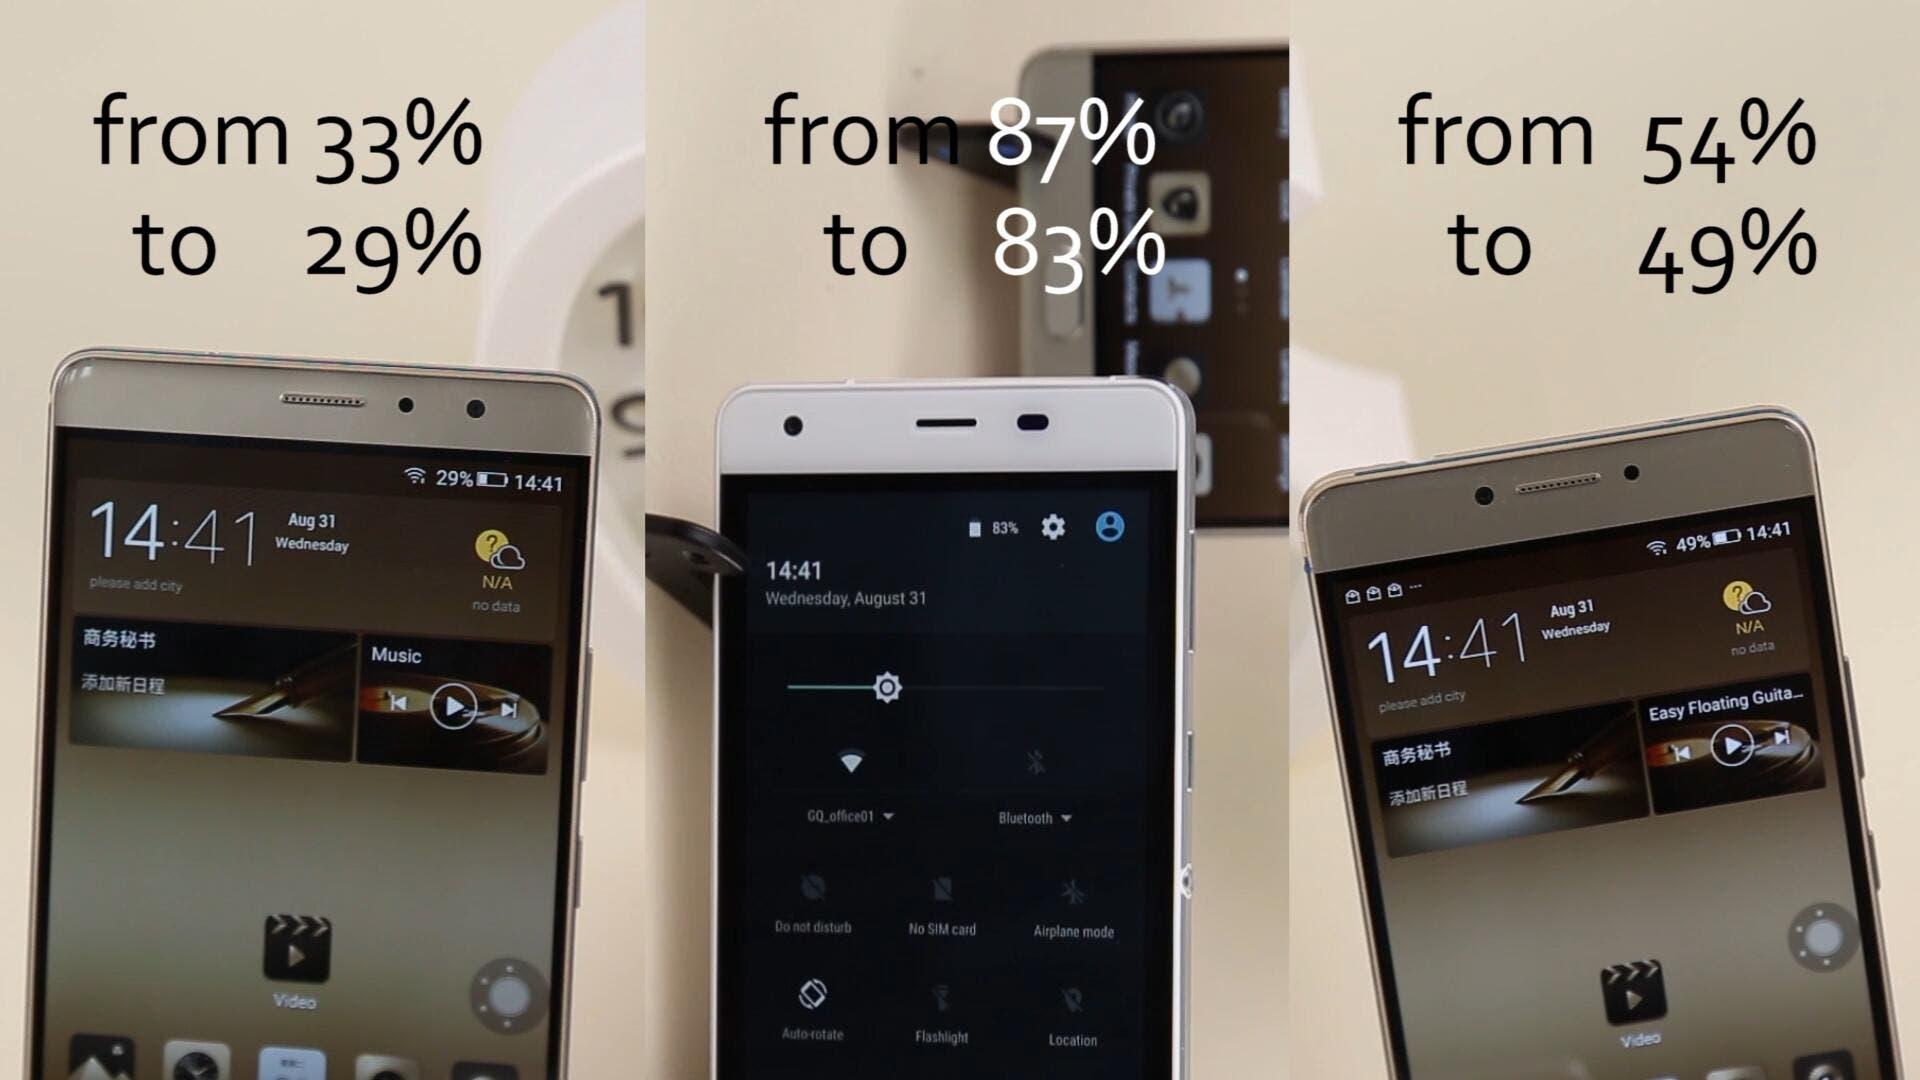 Ulefone Power vs Gionee M6 vs Gionee M6 Plus